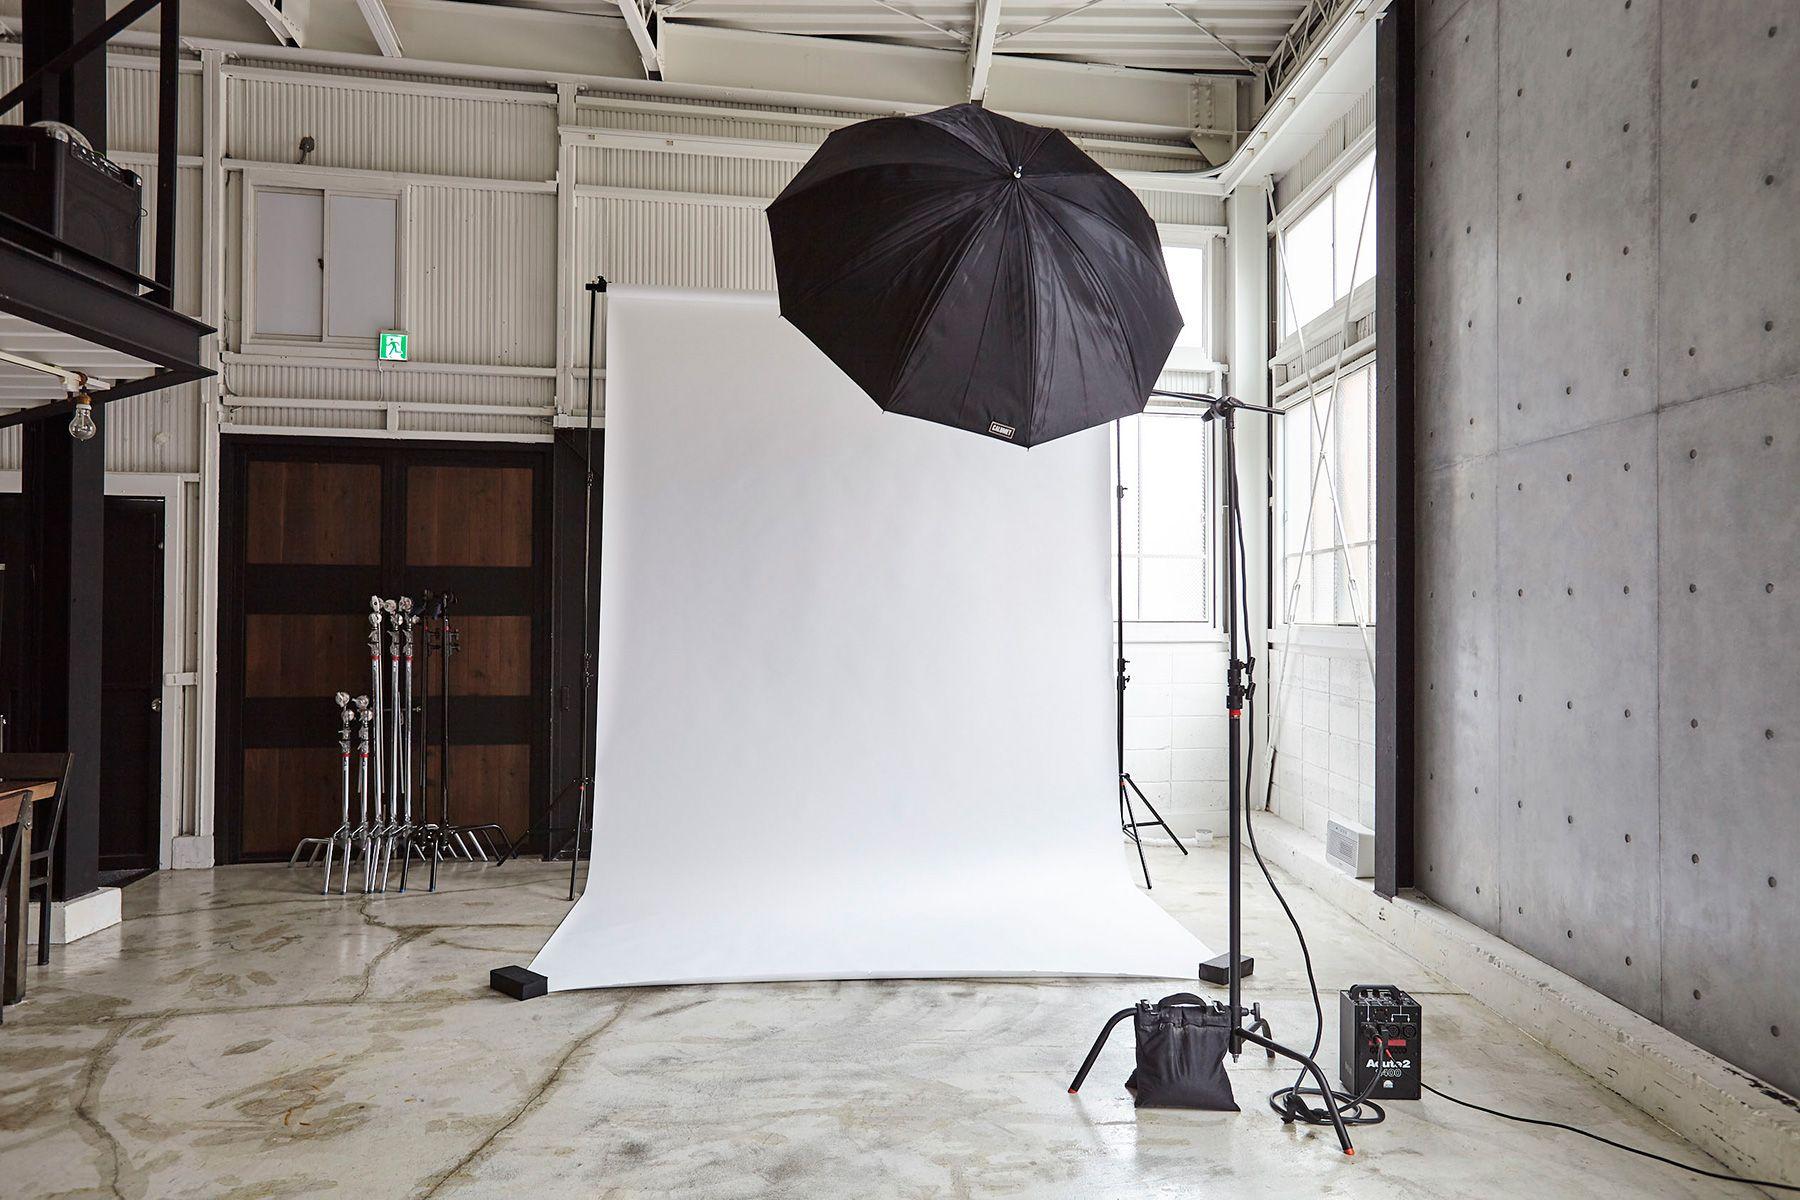 Studio I-AM (スタジオ アイアム)ペーパー設置可能